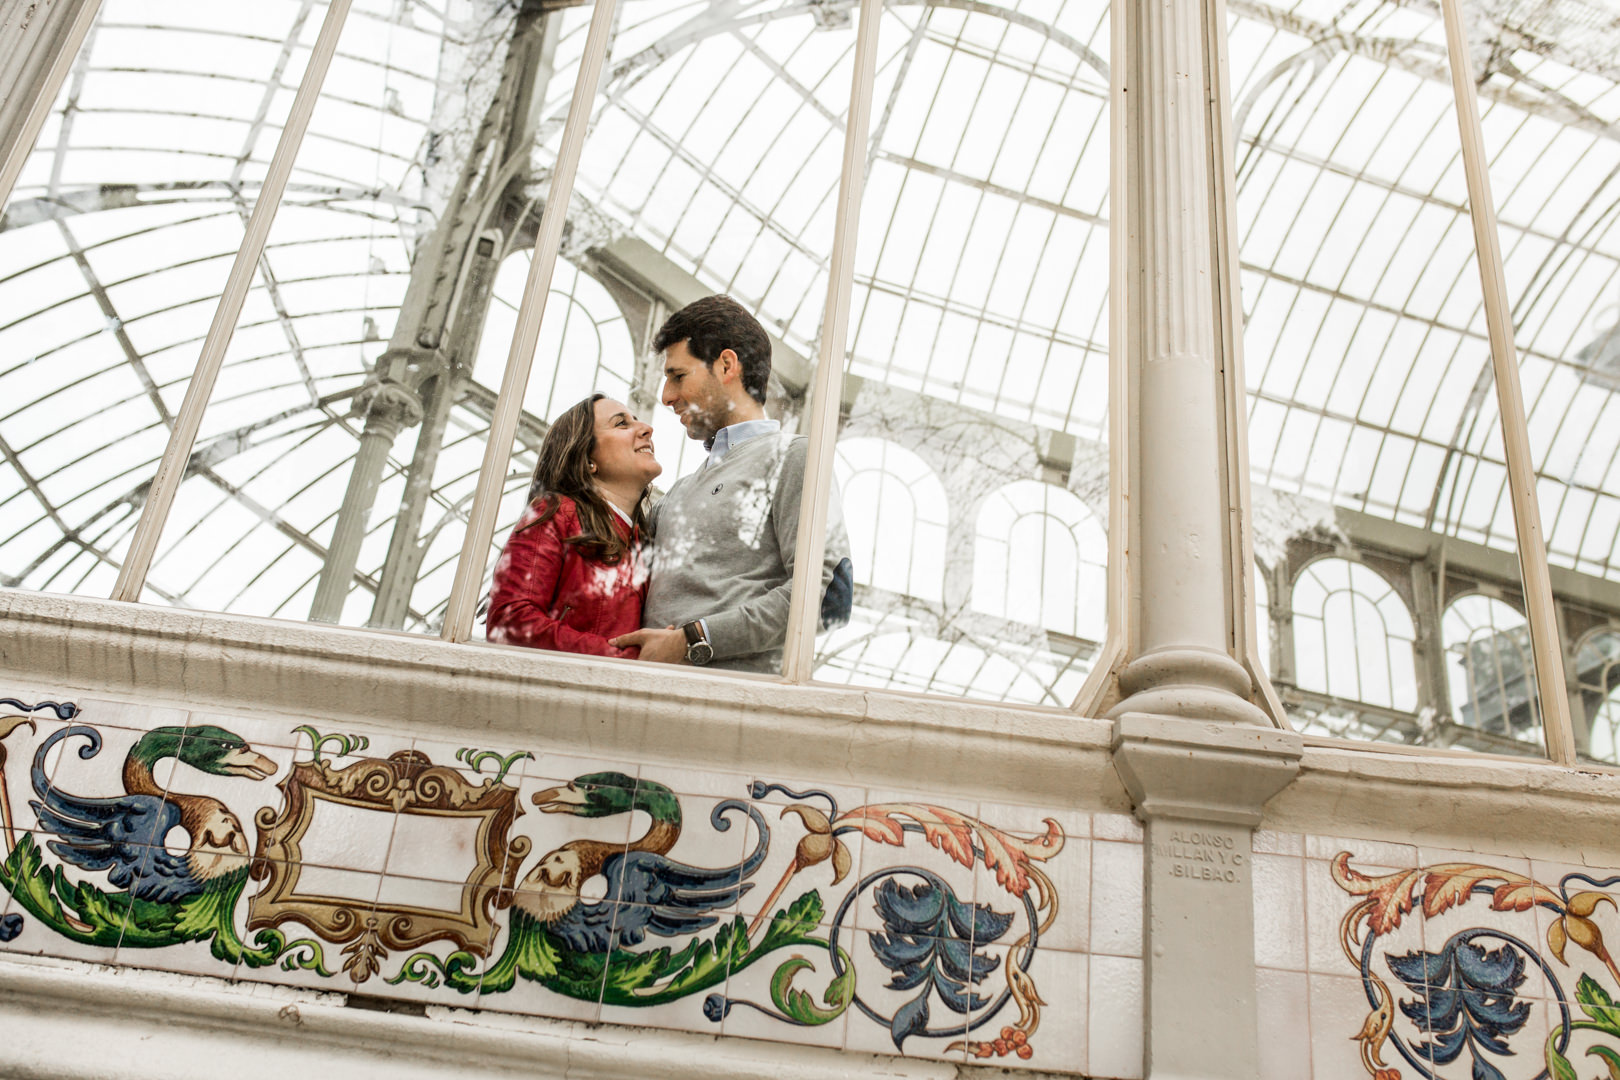 Preboda-Madrid-Maria-David-engagement-Rafael-Torres-fotografo-bodas-sevilla-madrid-barcelona-wedding-photographer--7.jpg